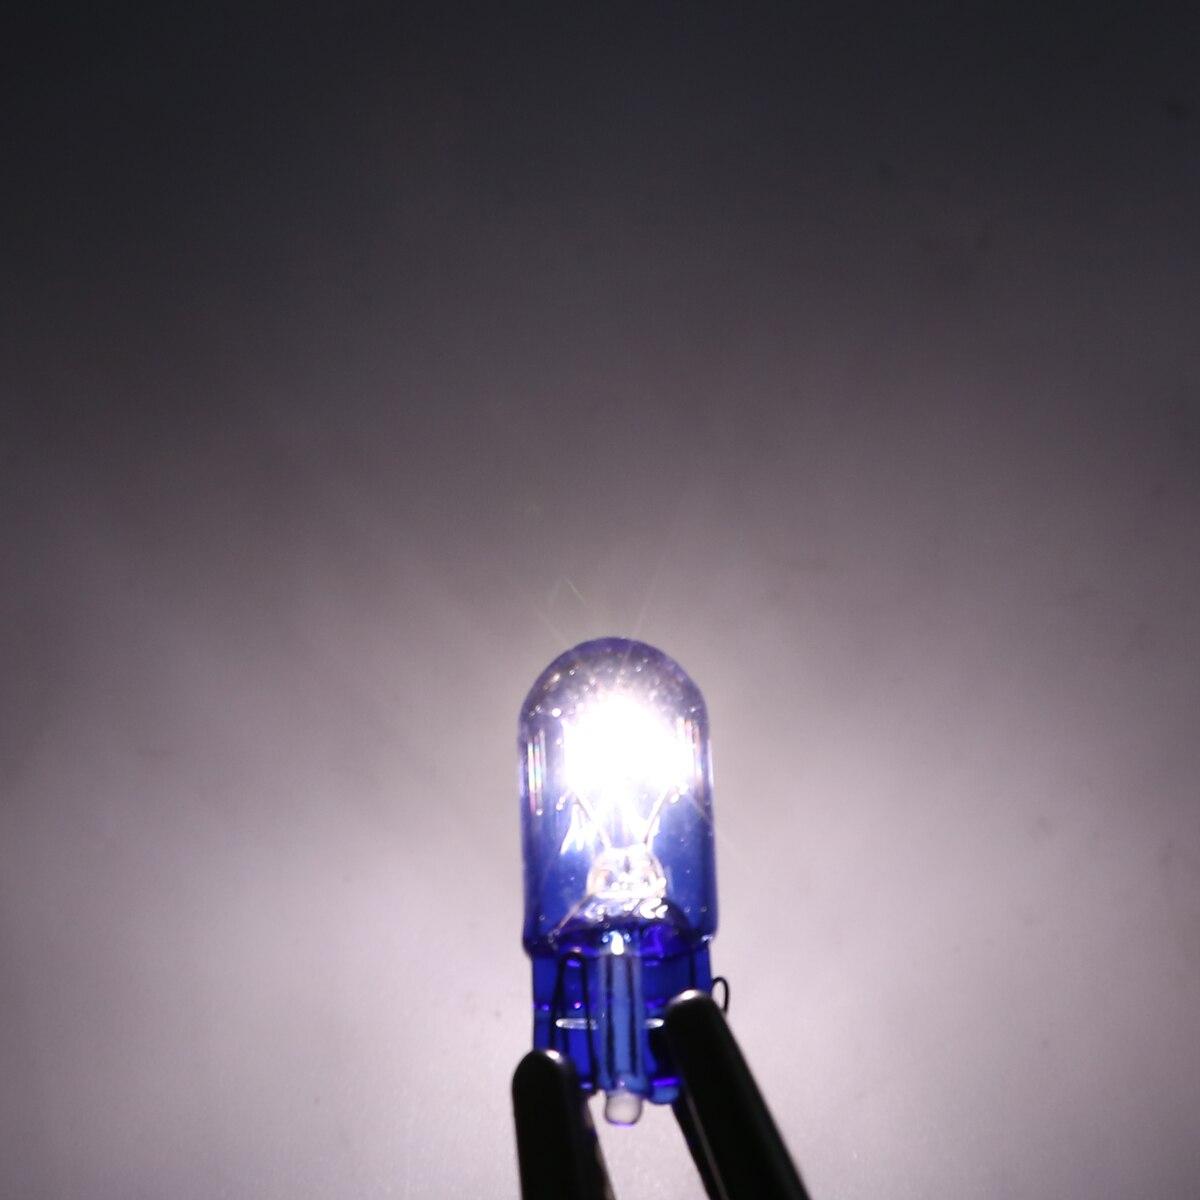 10pcs Car T10 Halogen w5w 168 Wedges 12V 5W Xexon Signal Lamp Super White Instrument Light Reading Light Clearance Lamp